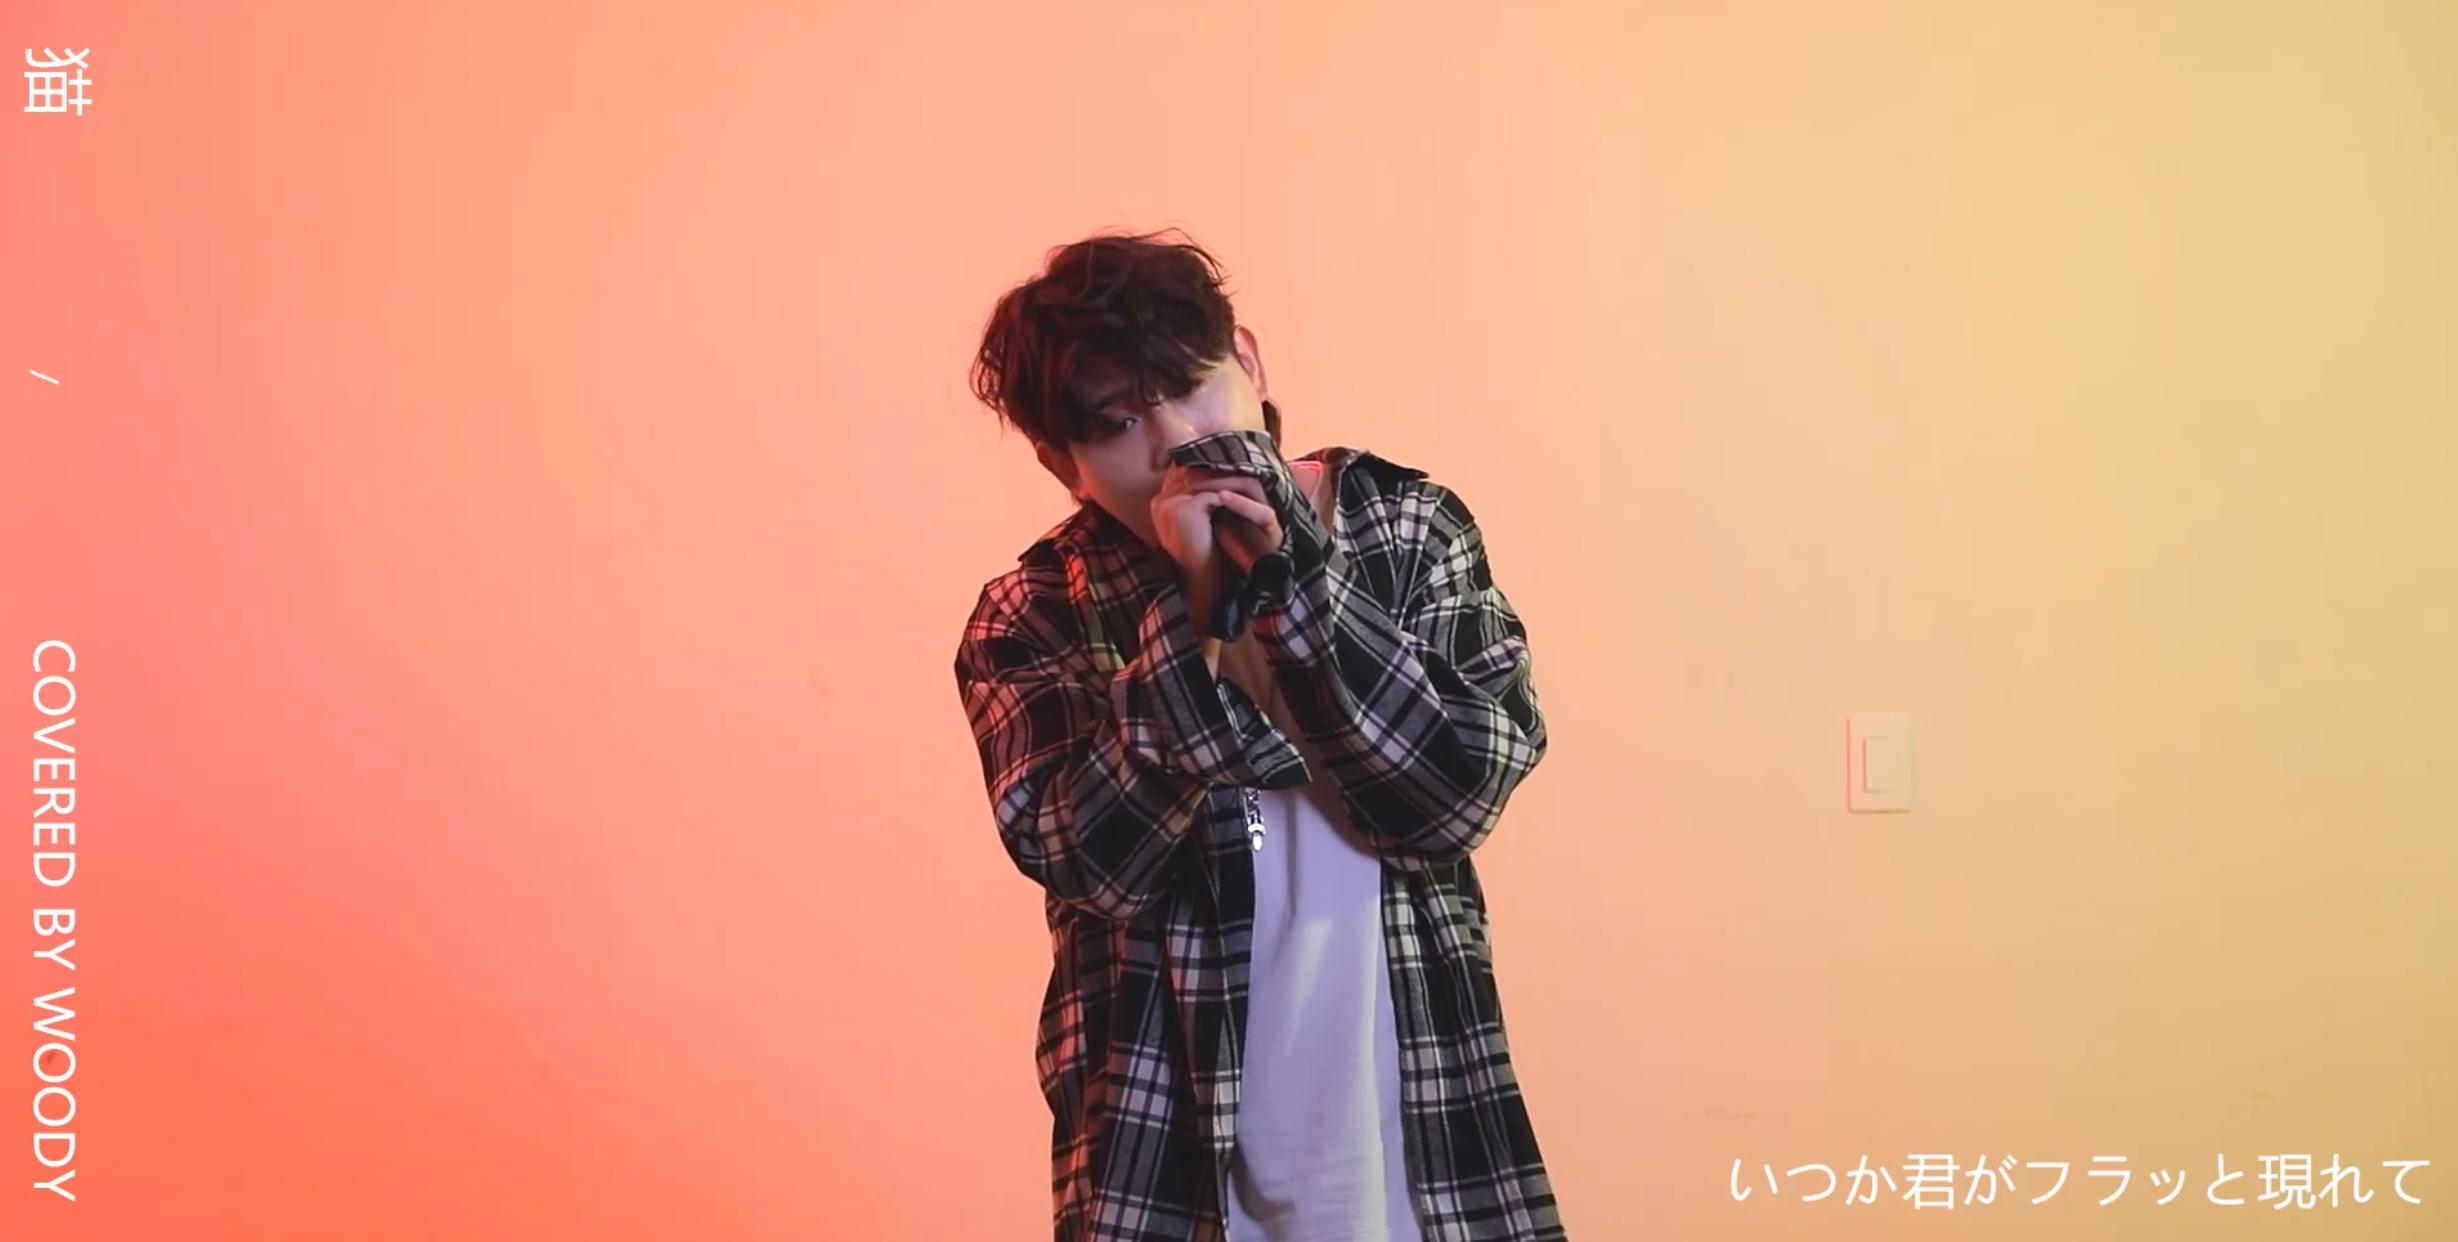 K-POPアーティストが歌う日本のヒット曲企画第8弾が公開! WOODYが最高の歌声で「DISH//」の名曲「猫」をカバー